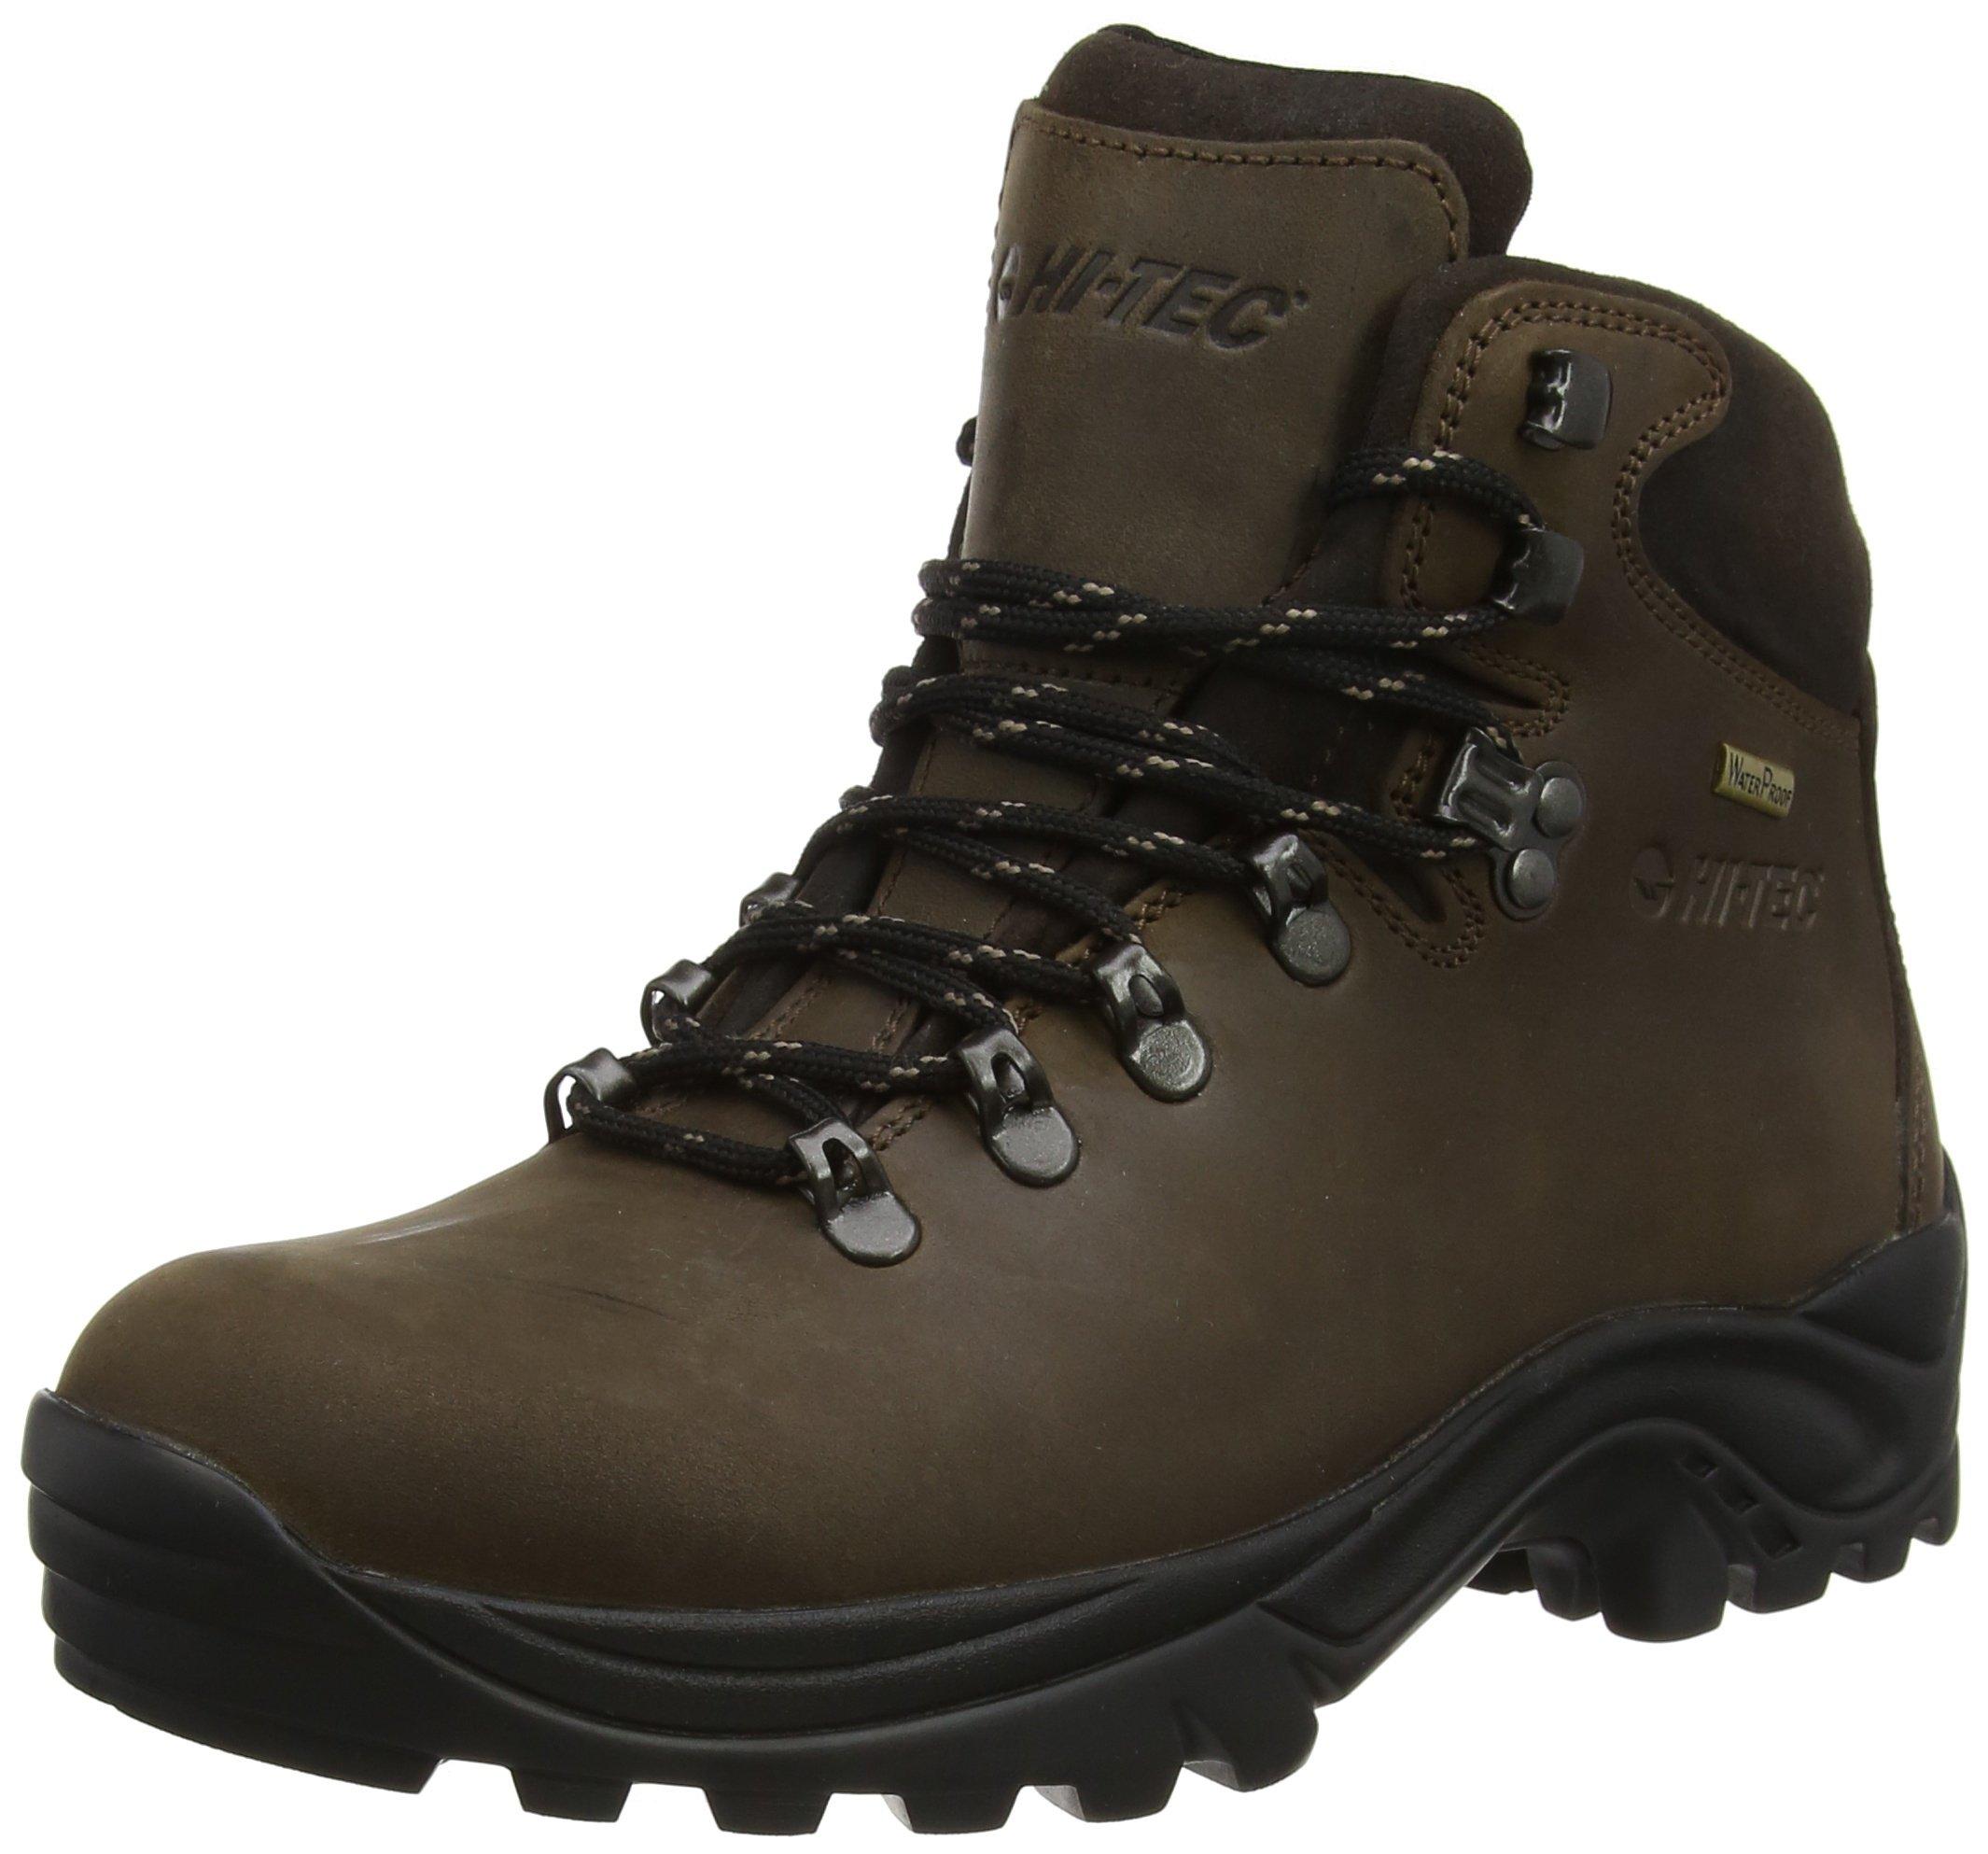 Hi-Tec Ravine WP Women's High Rise Hiking Boots 1